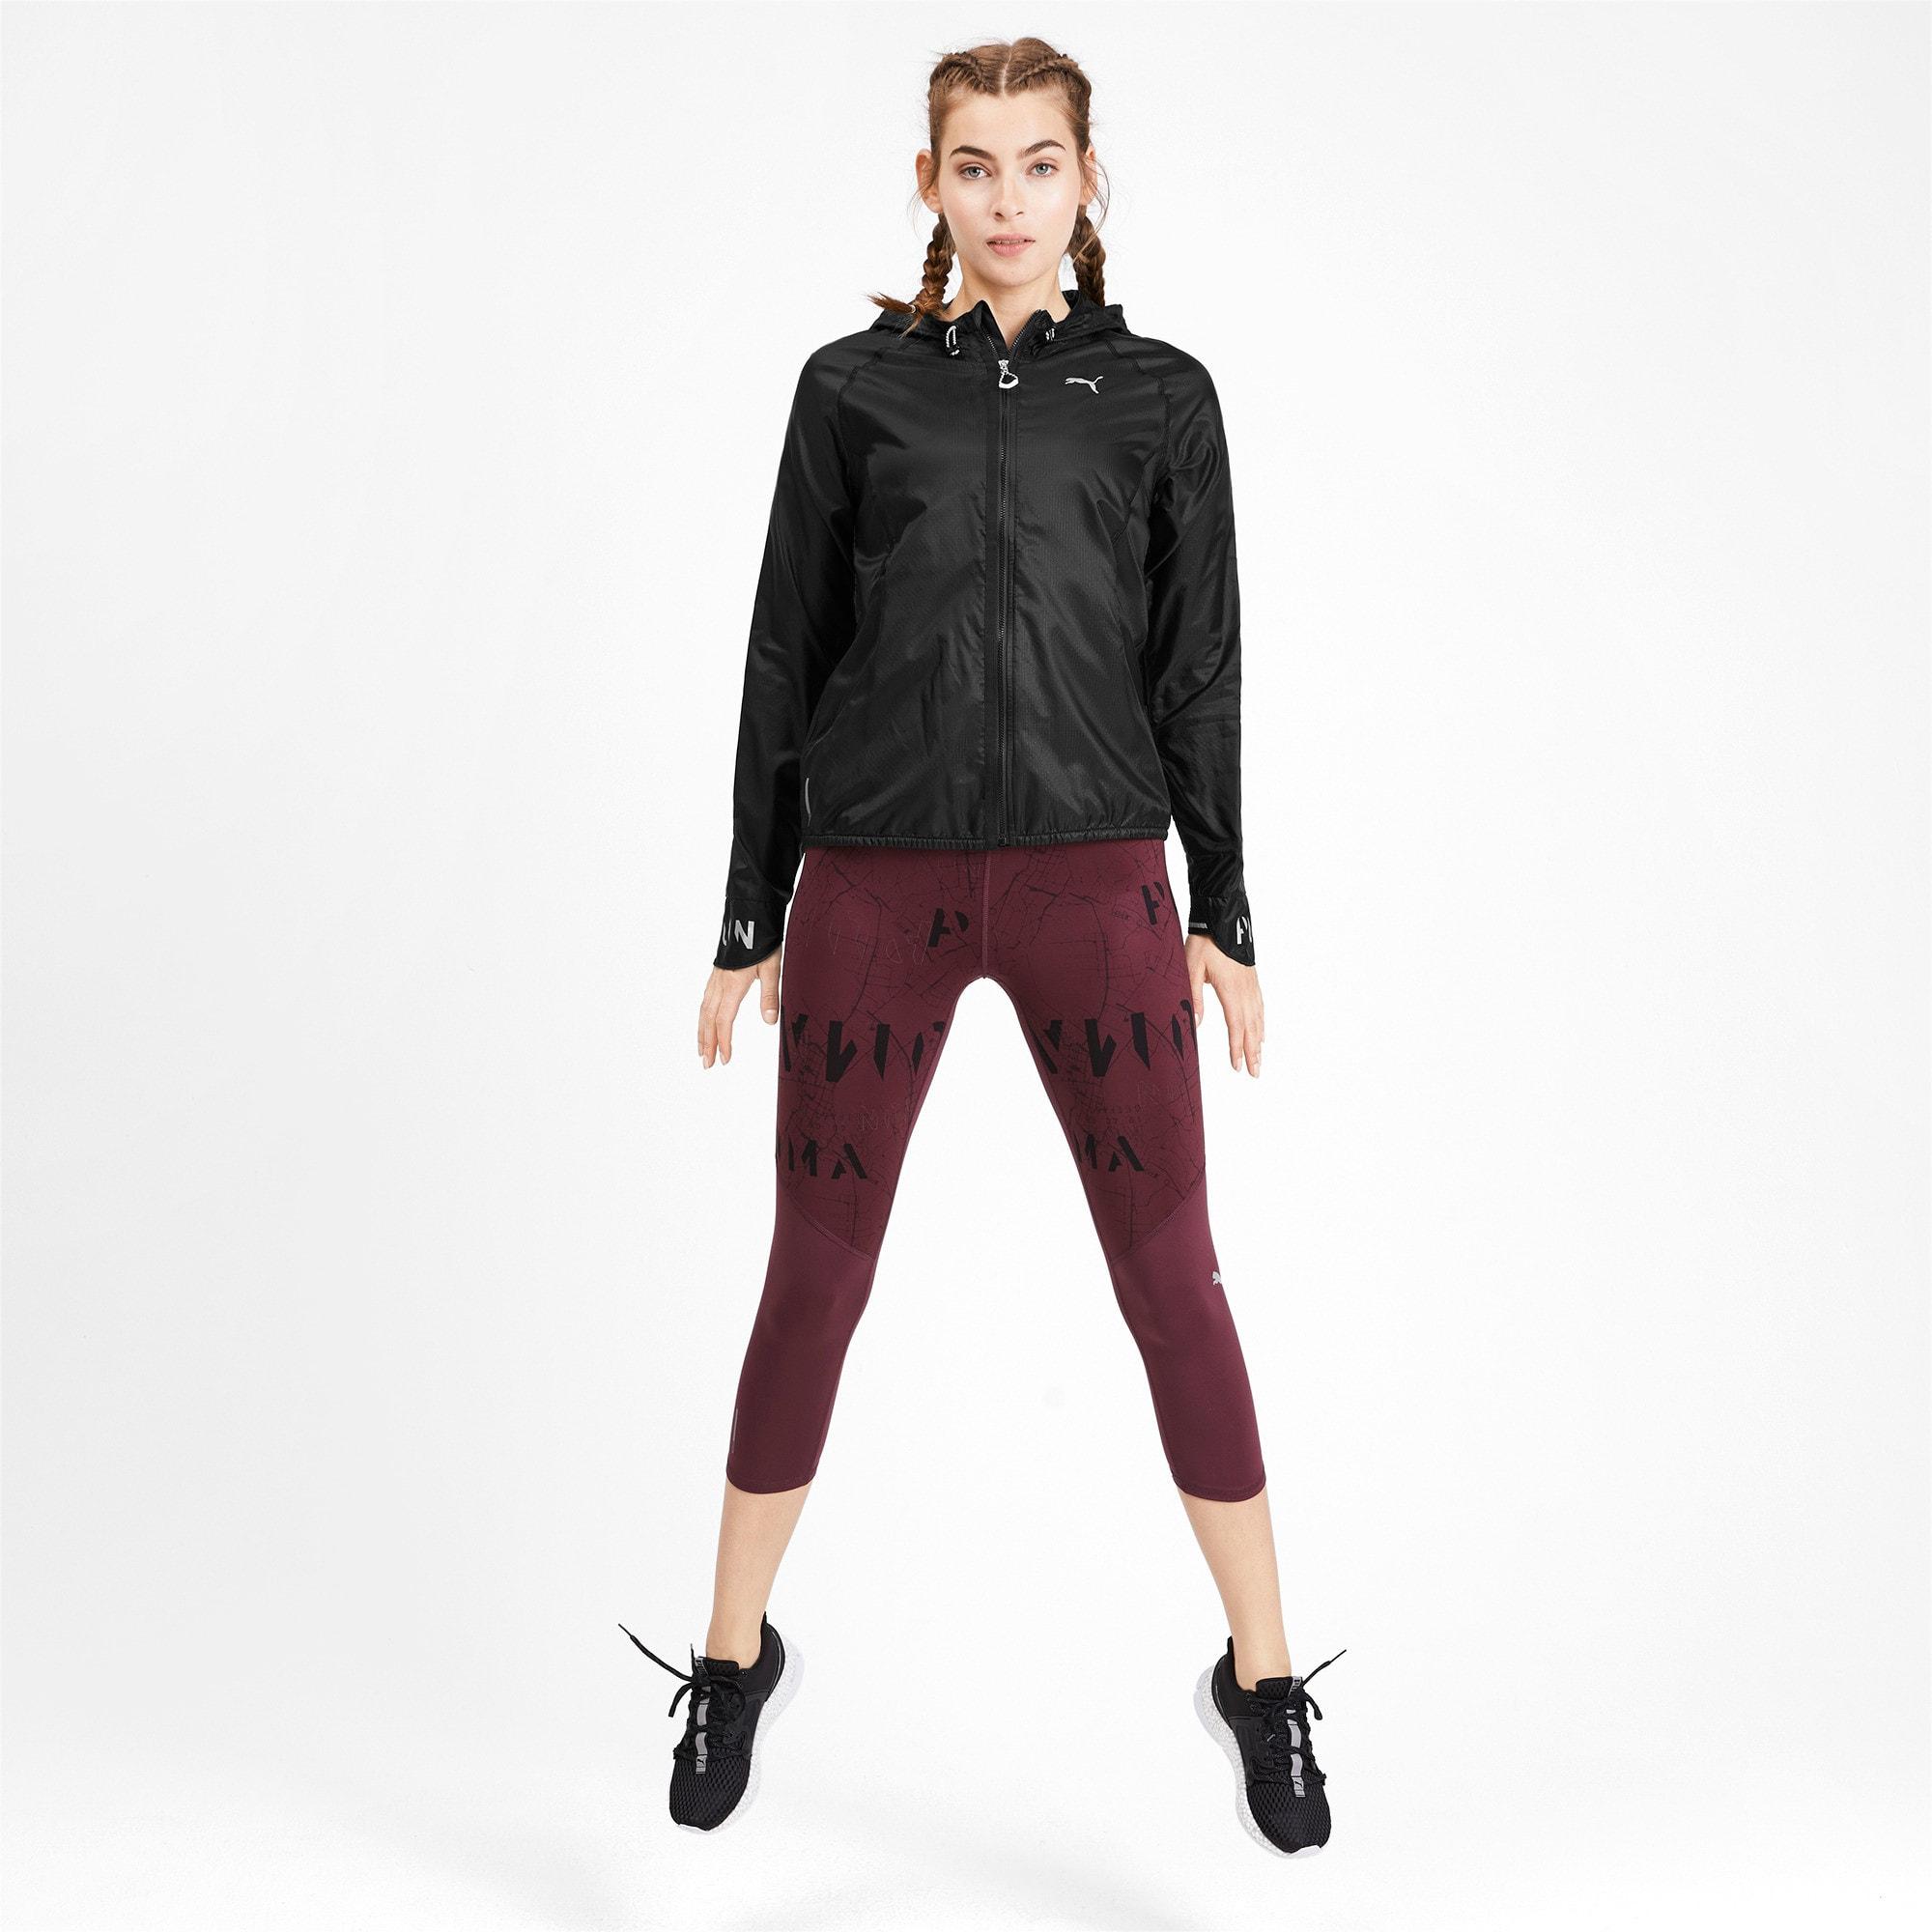 Thumbnail 3 of Get Fast Hooded Full Zip Women's Running Jacket, Puma Black, medium